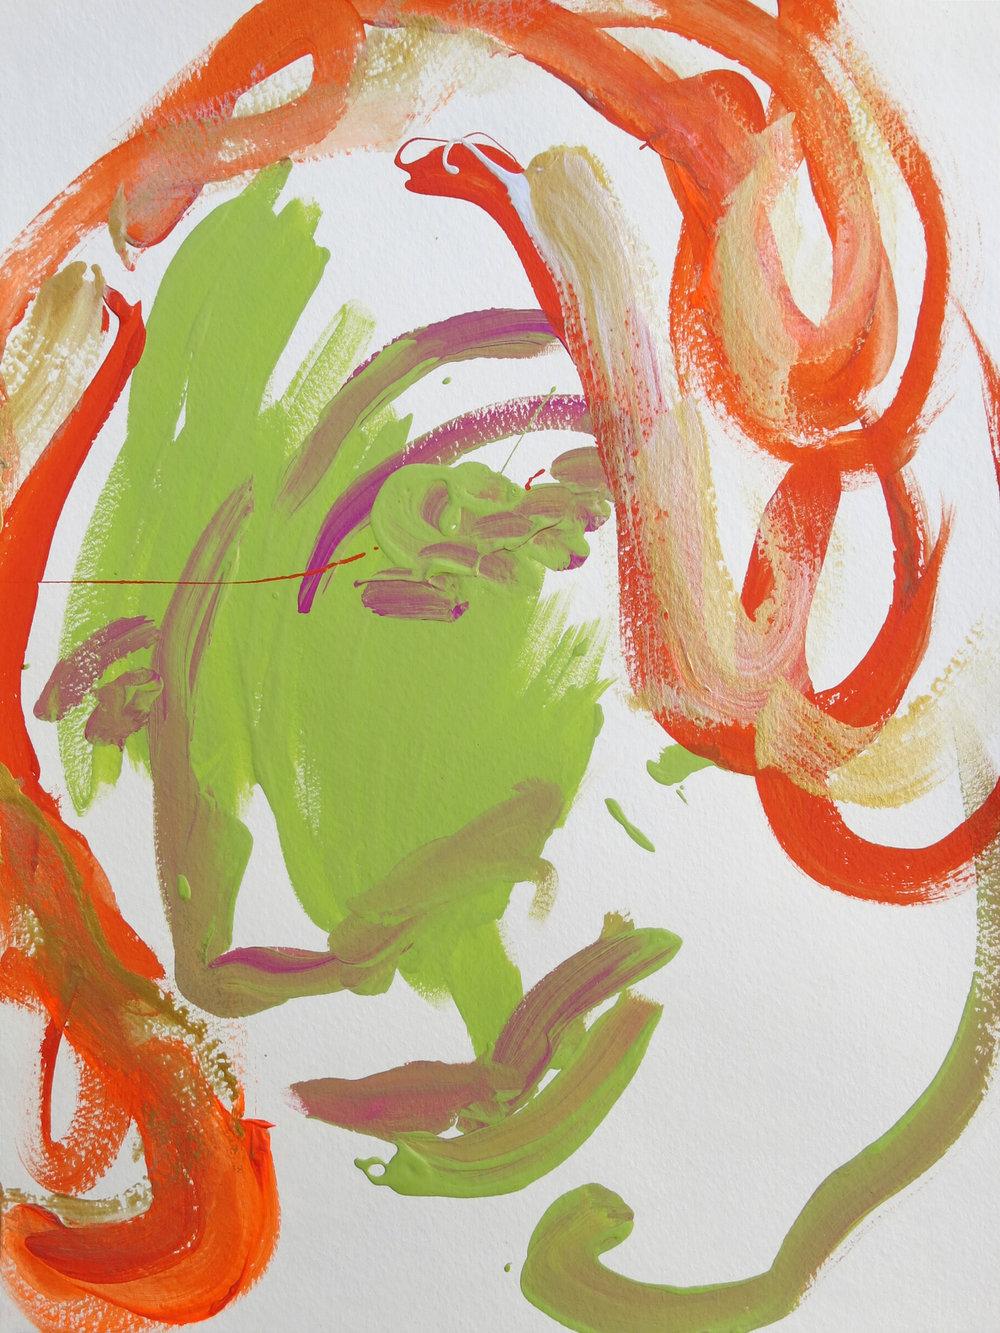 Barbra Streisand Portrait #193